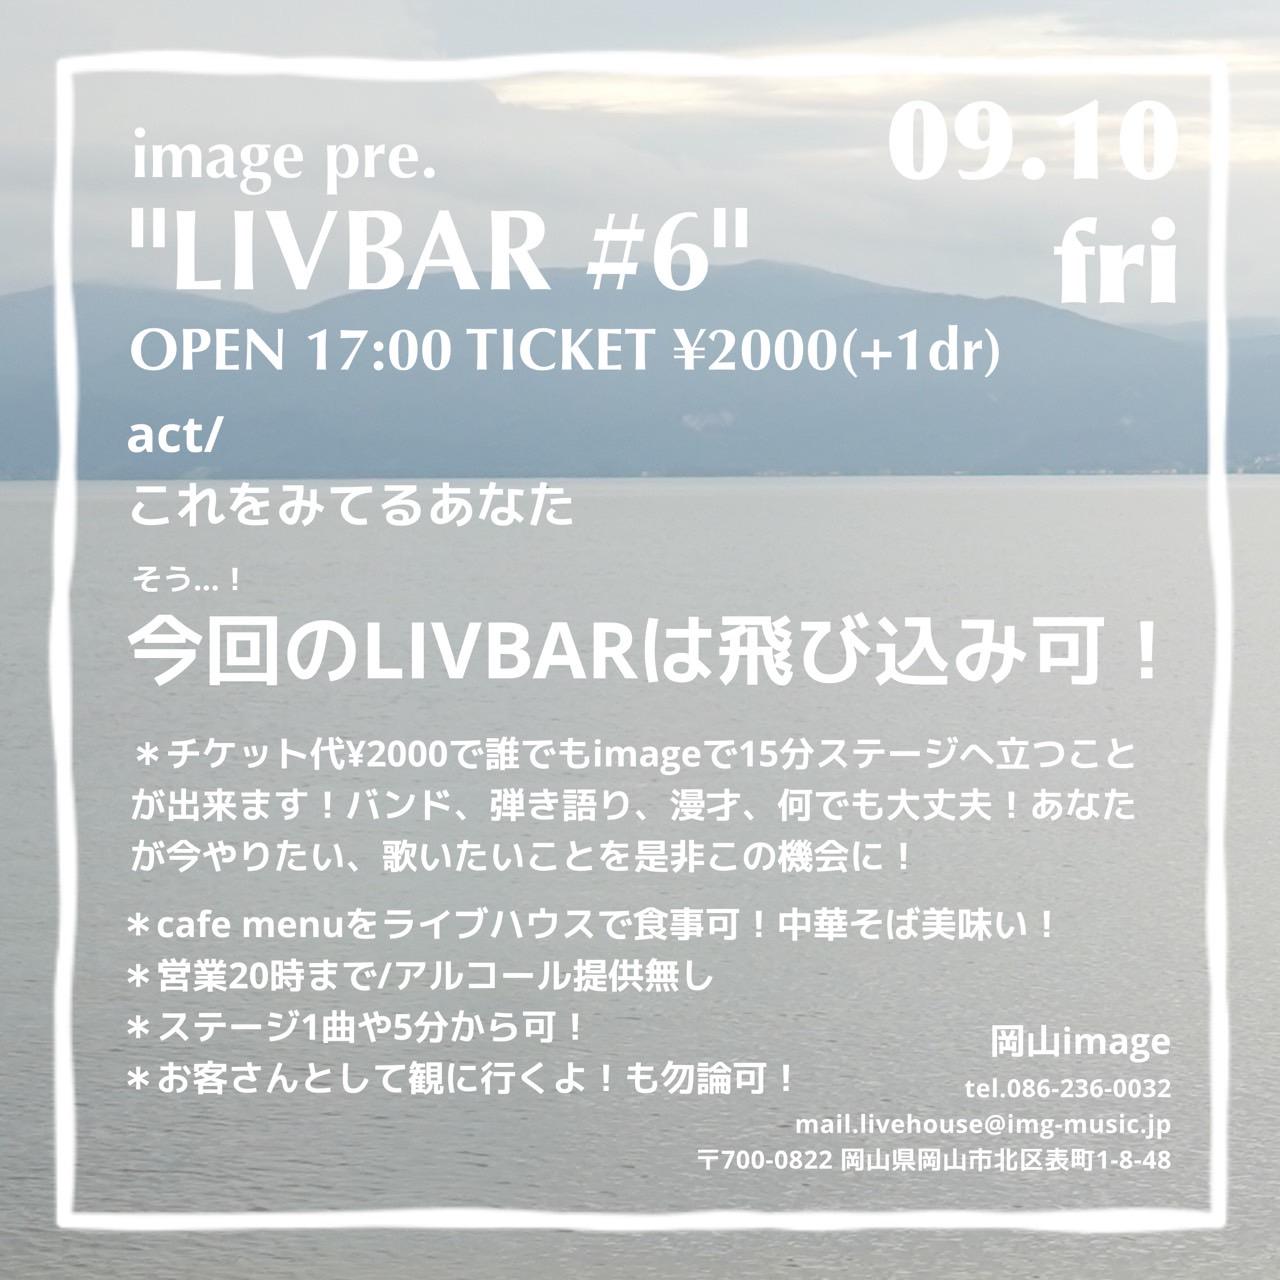 "image pre.""LIVBAR #6"""